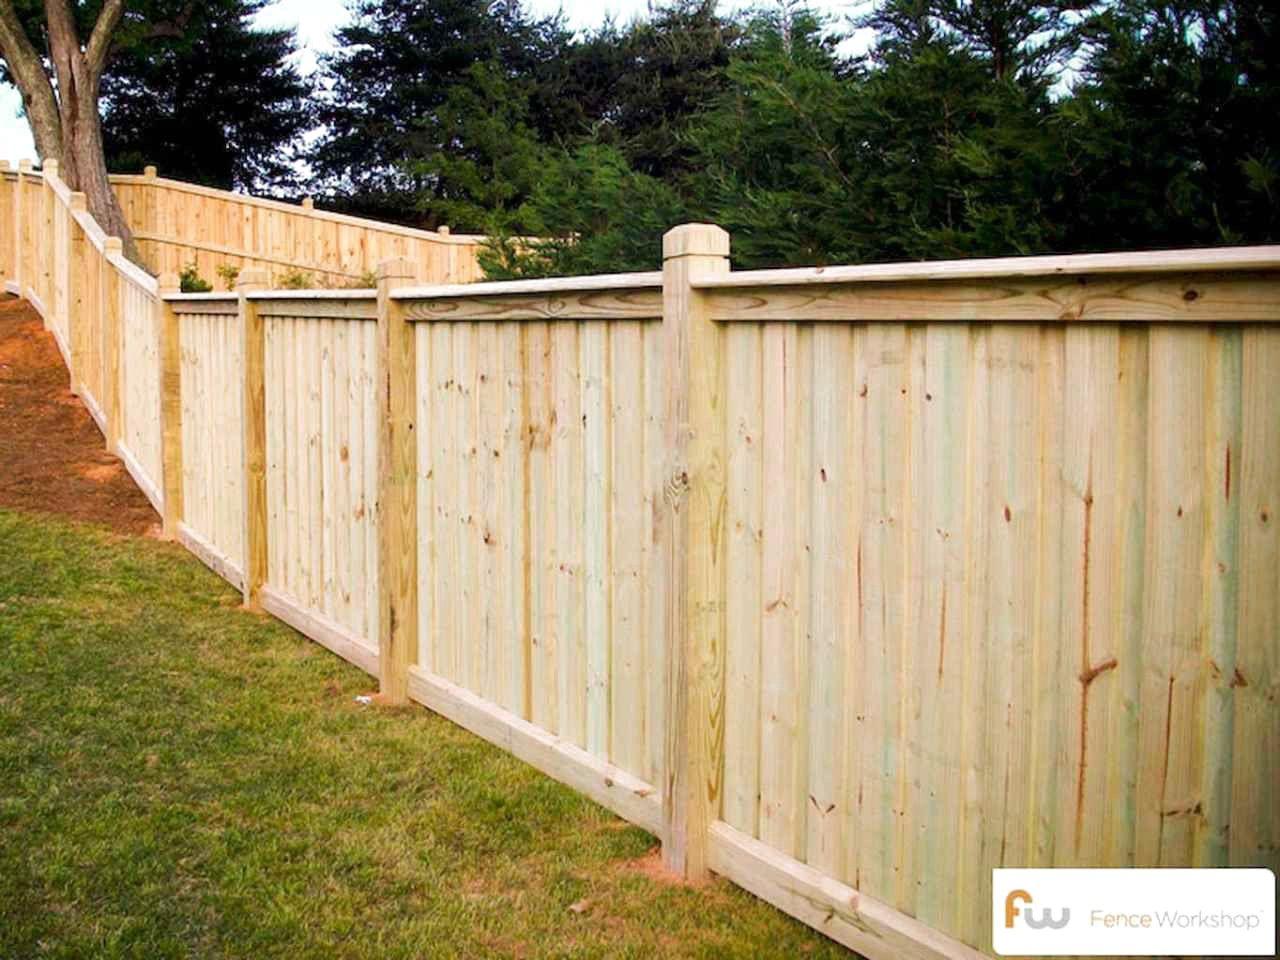 50 Simple Backyard Privacy Fence Decoration Ideas On A Budget Privacy Fence Designs Fence Decor Privacy Fence Decorations